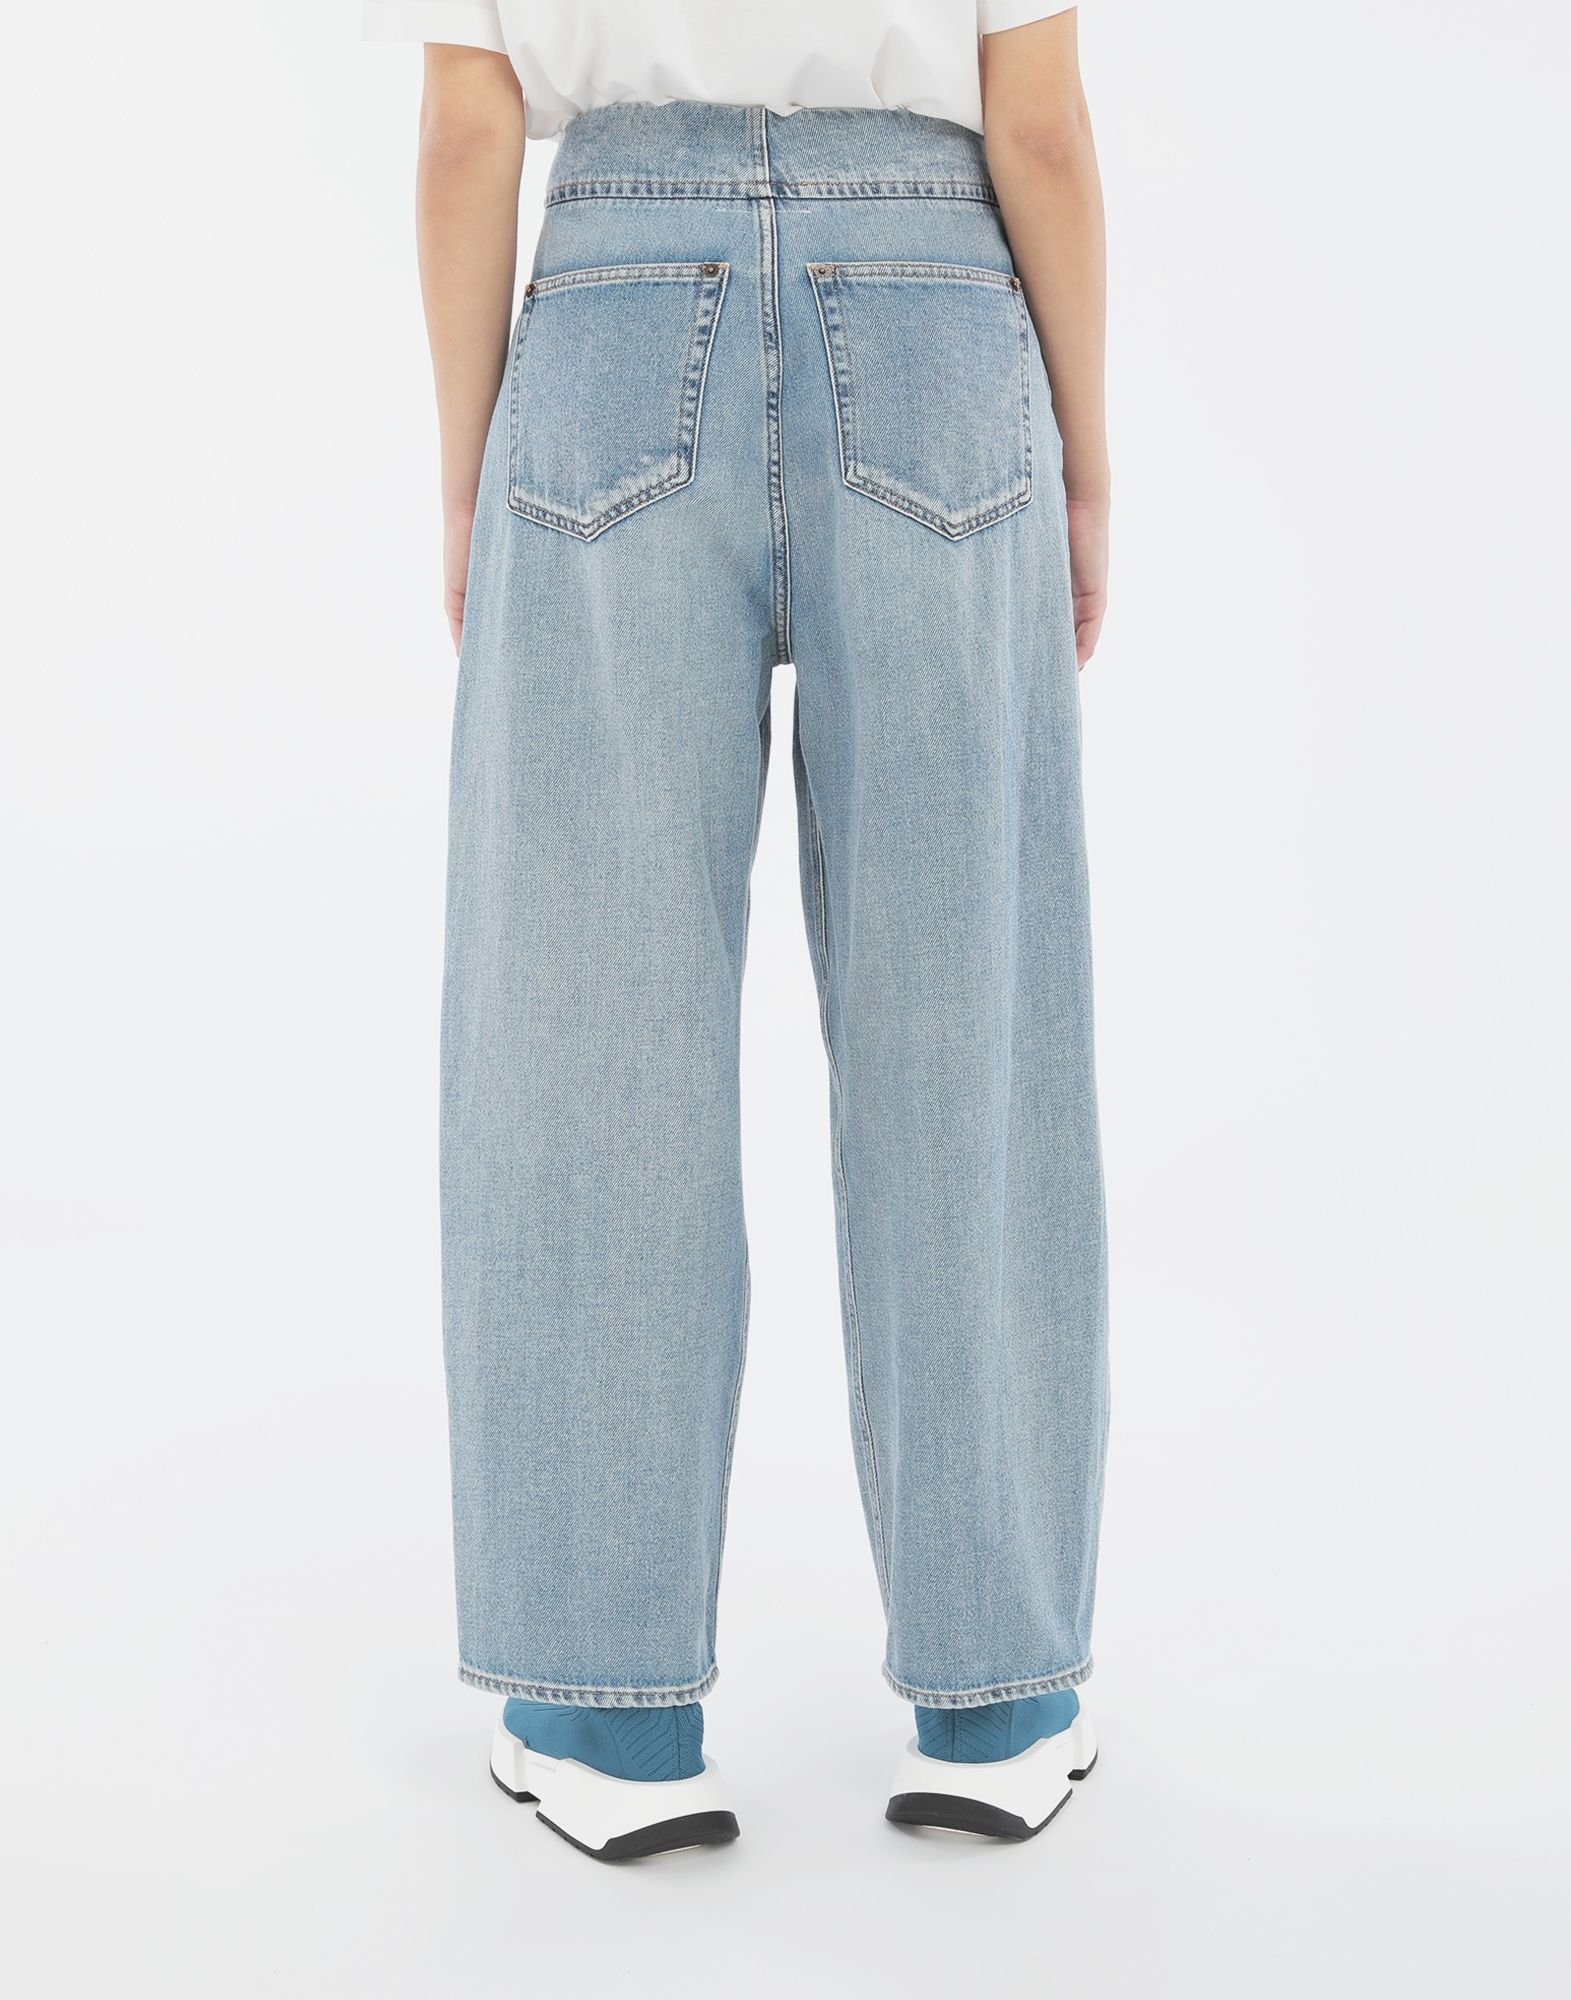 MM6 MAISON MARGIELA Jean cocon Pantalon en jean Femme e